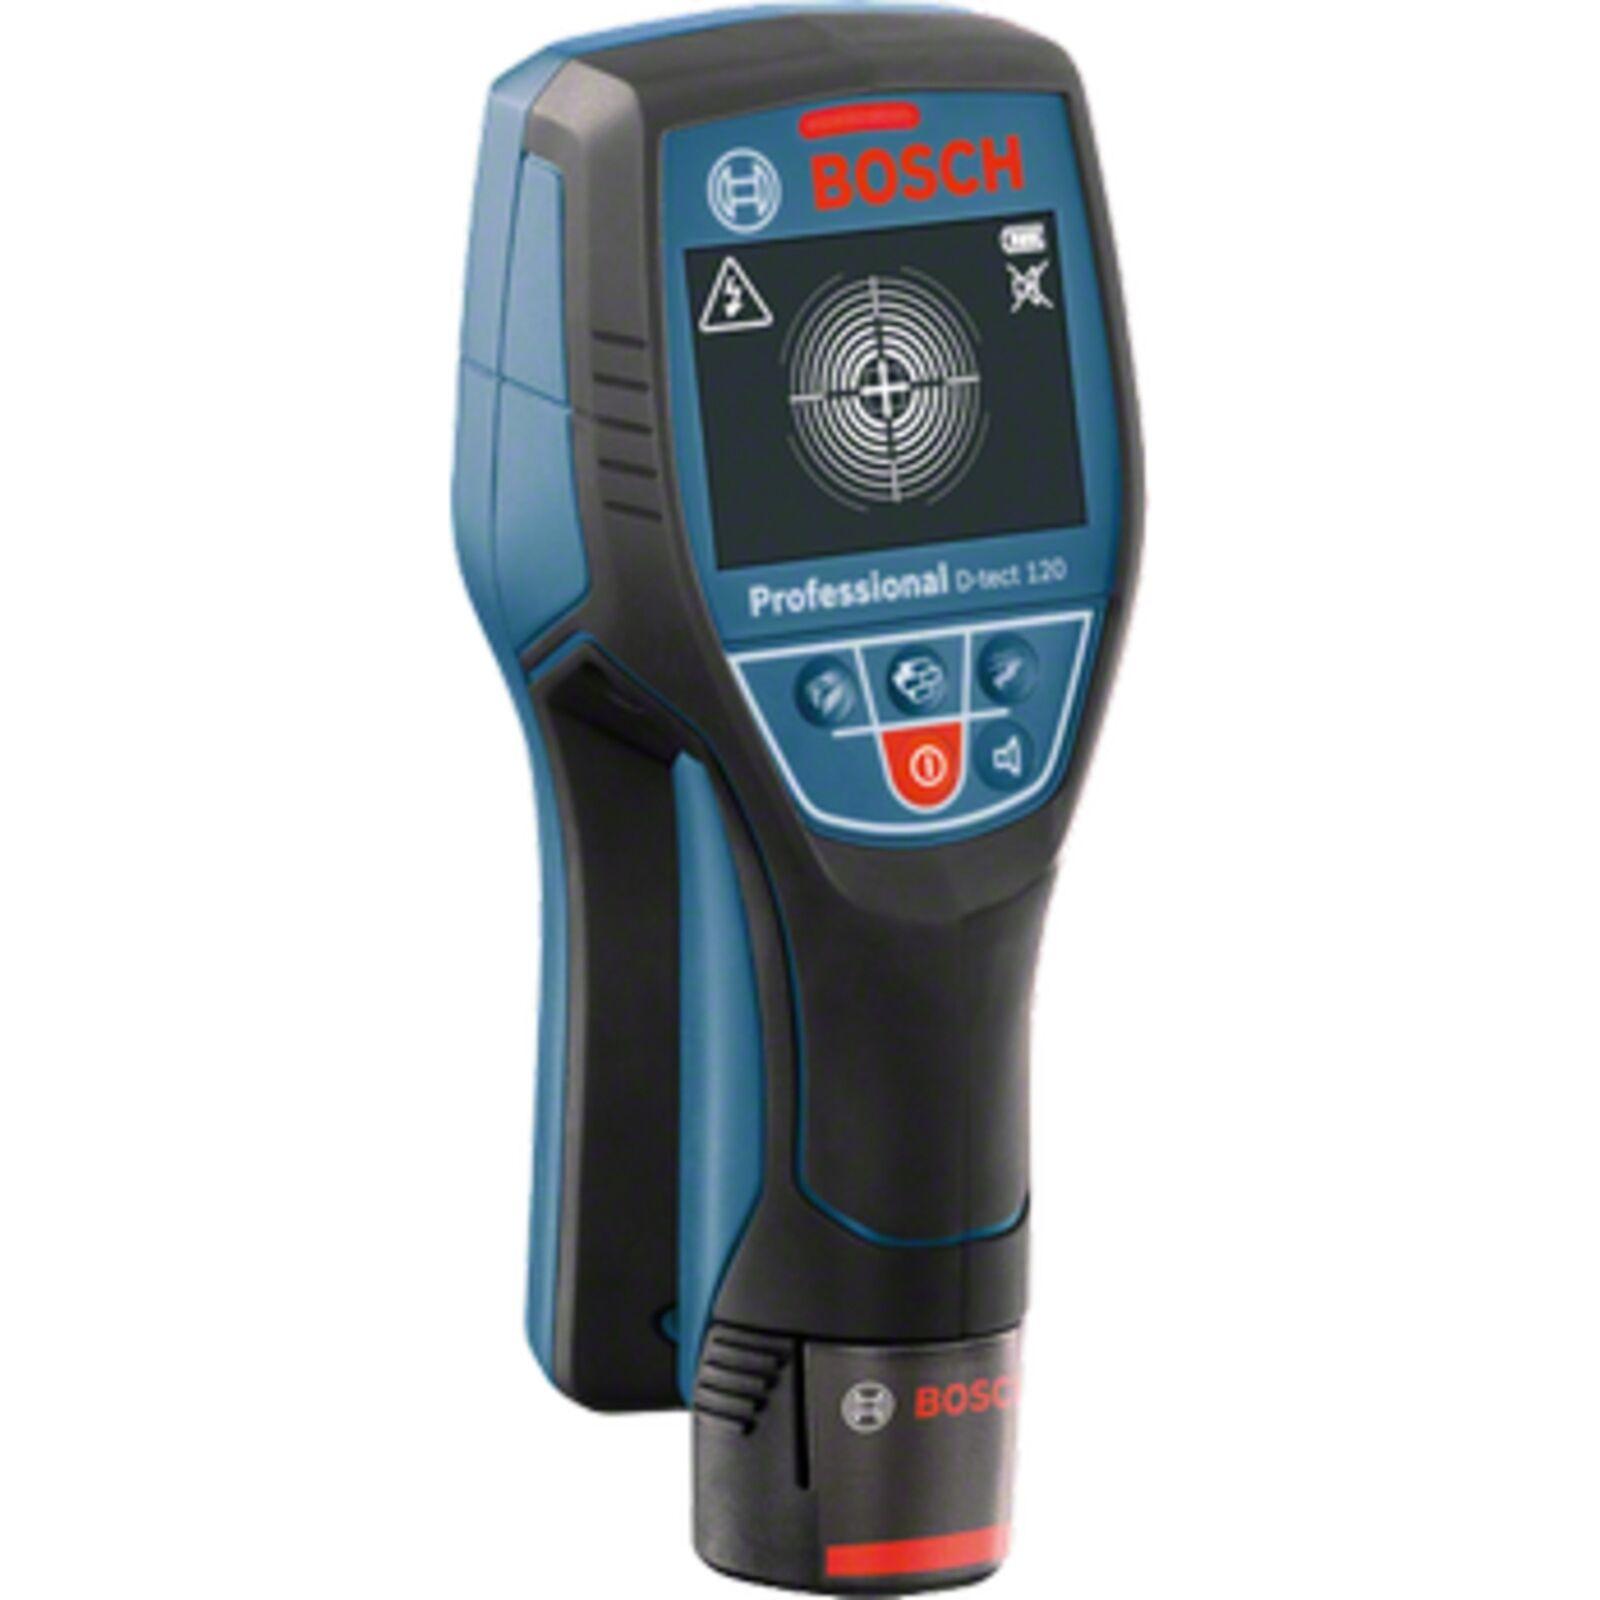 Bosch Professional Ortungsgerät Wallscanner D-tect 120 Professional, blau